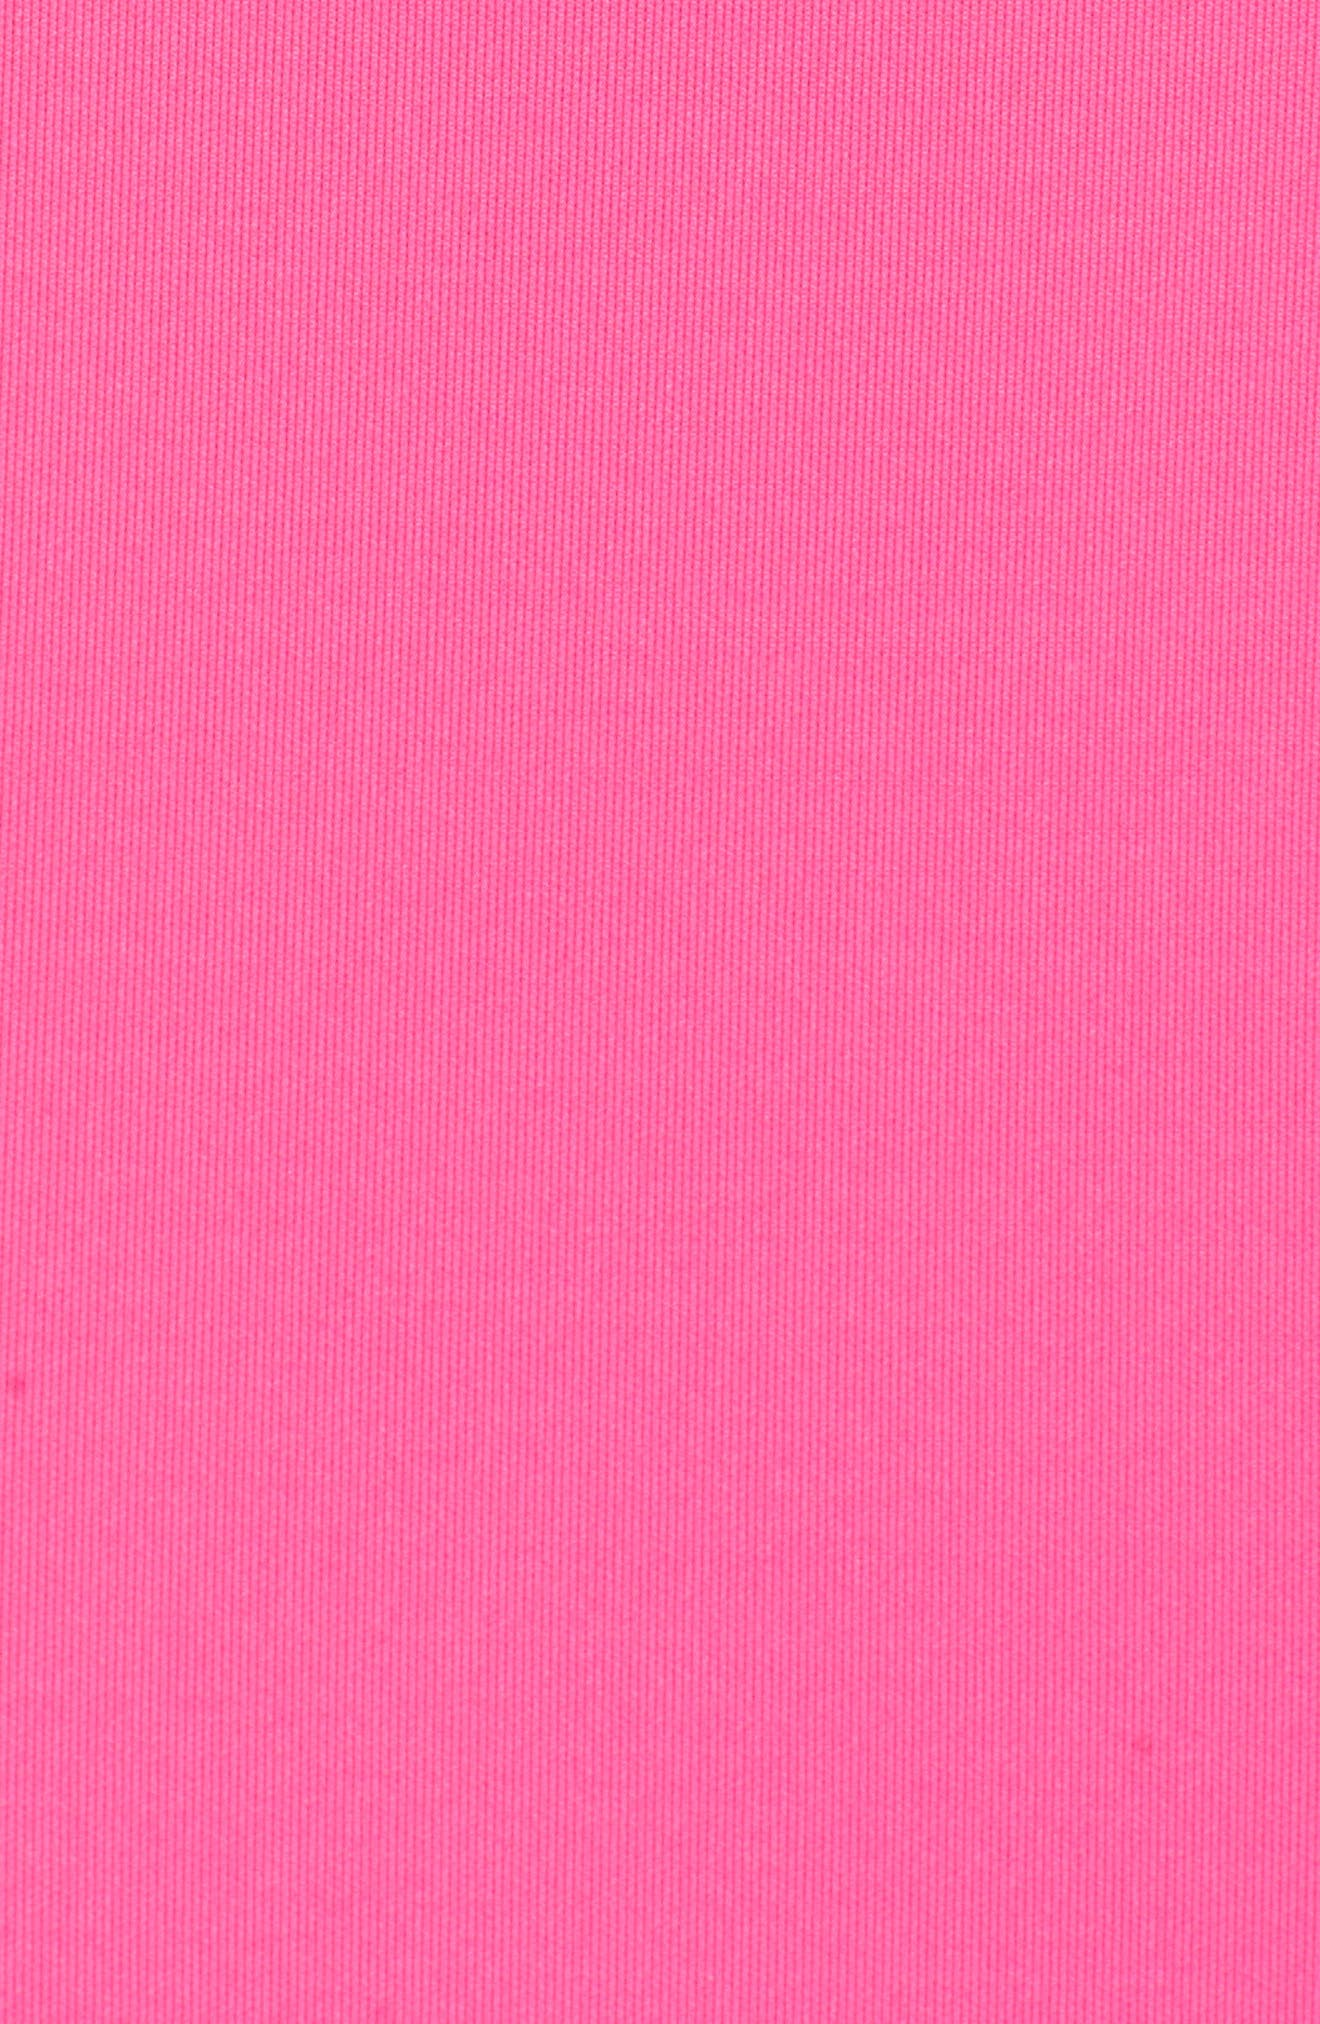 One-Shoulder Ruffle Sheath Dress,                             Alternate thumbnail 6, color,                             Hot Pink